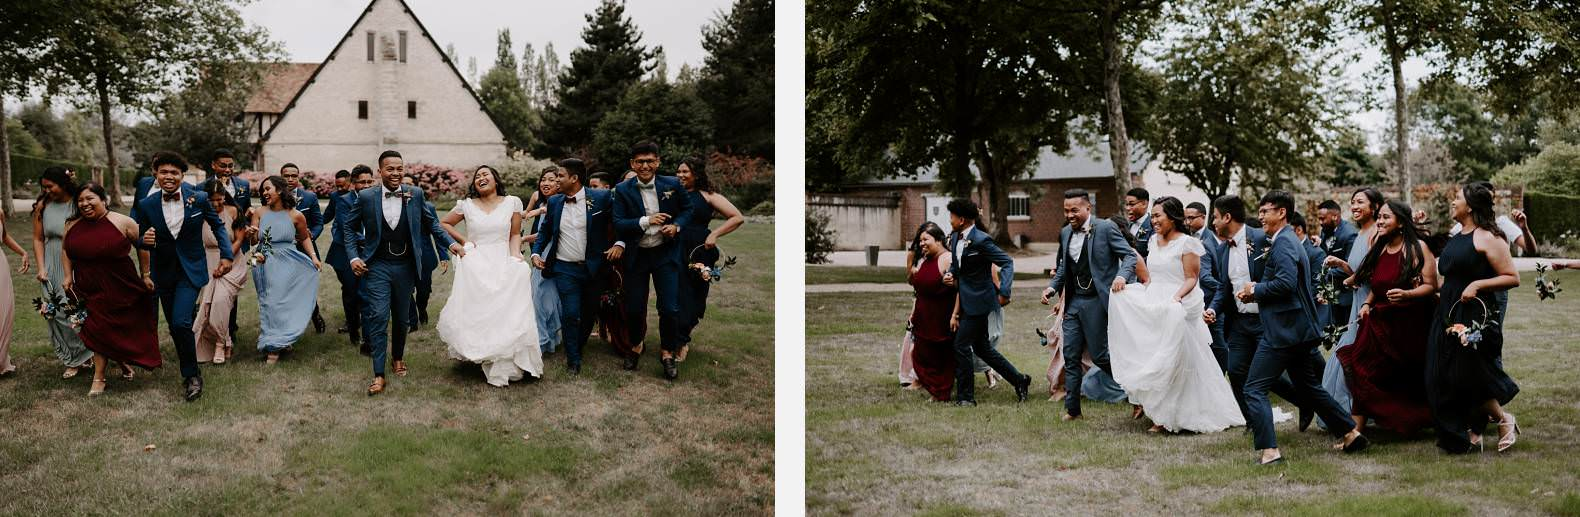 mariage manoir de corny photographe bel esprit 0050 1